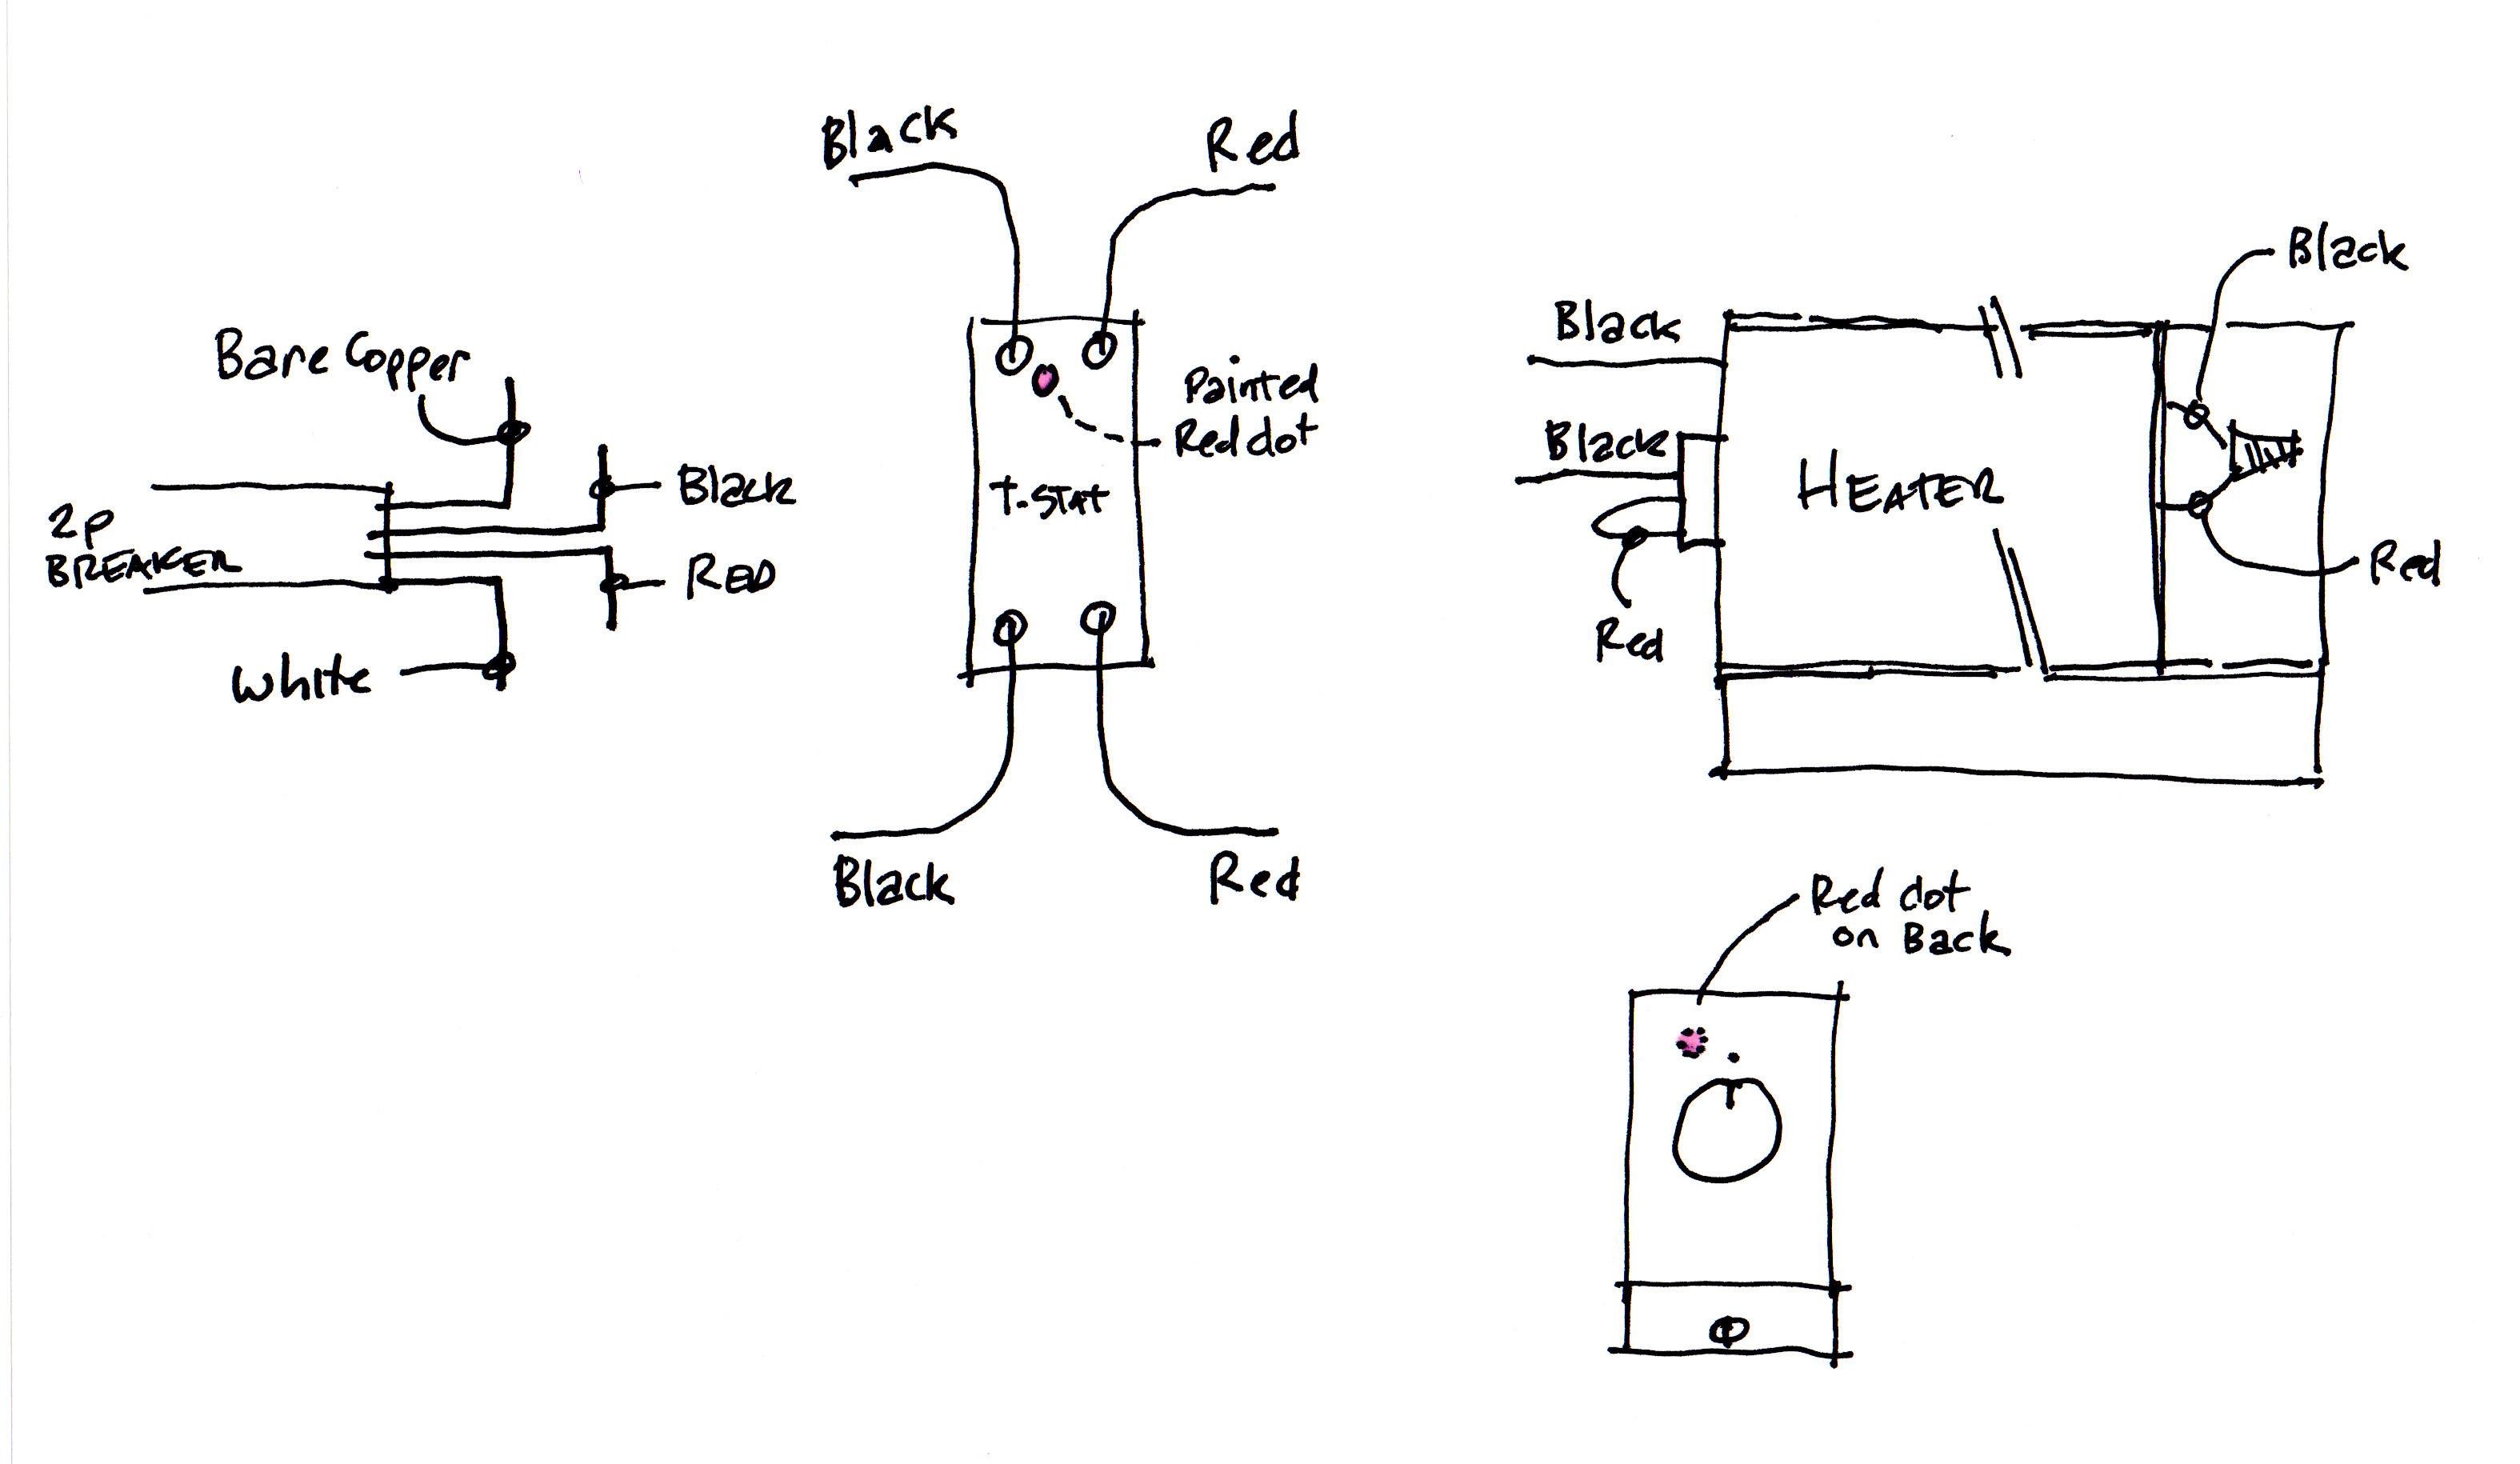 Marley D22 Thermostat Wiring Diagram Diagram Base Website Wiring Diagram -  VACUUMDIAGRAMS.INNOZ-TRACKS.DEinnoz-tracks